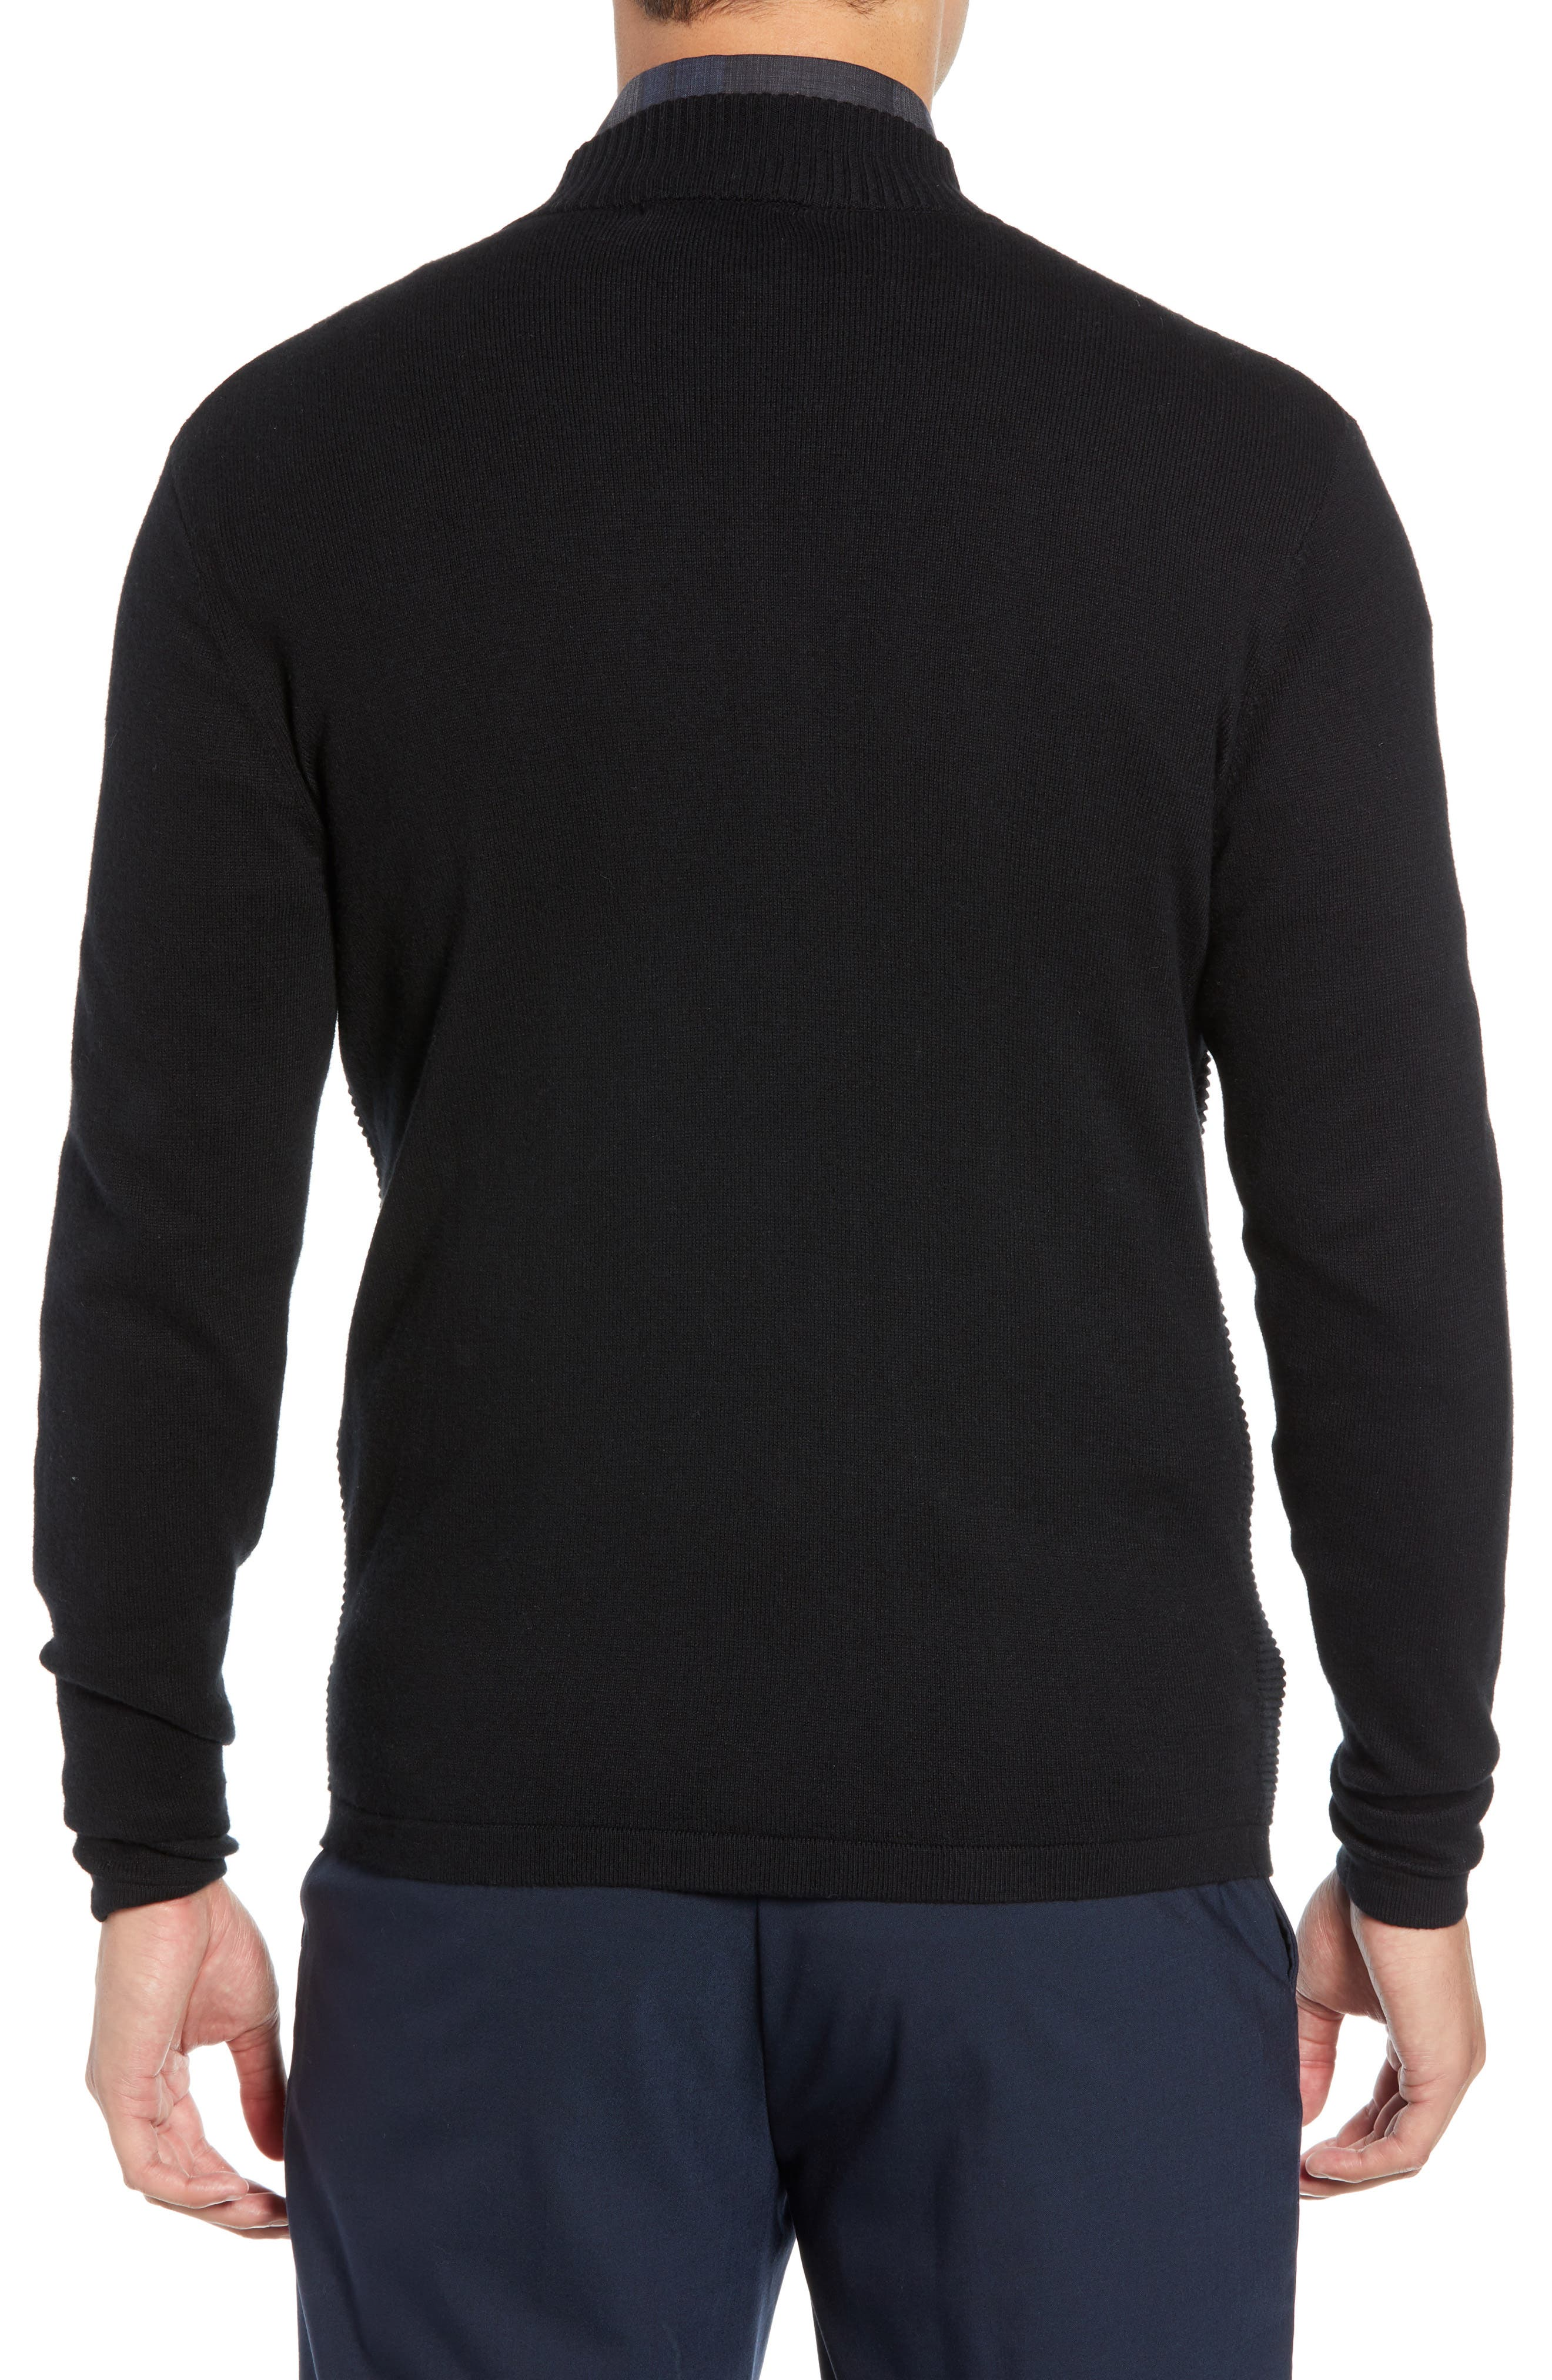 Yorkville Zip Sweater,                             Alternate thumbnail 2, color,                             BLACK